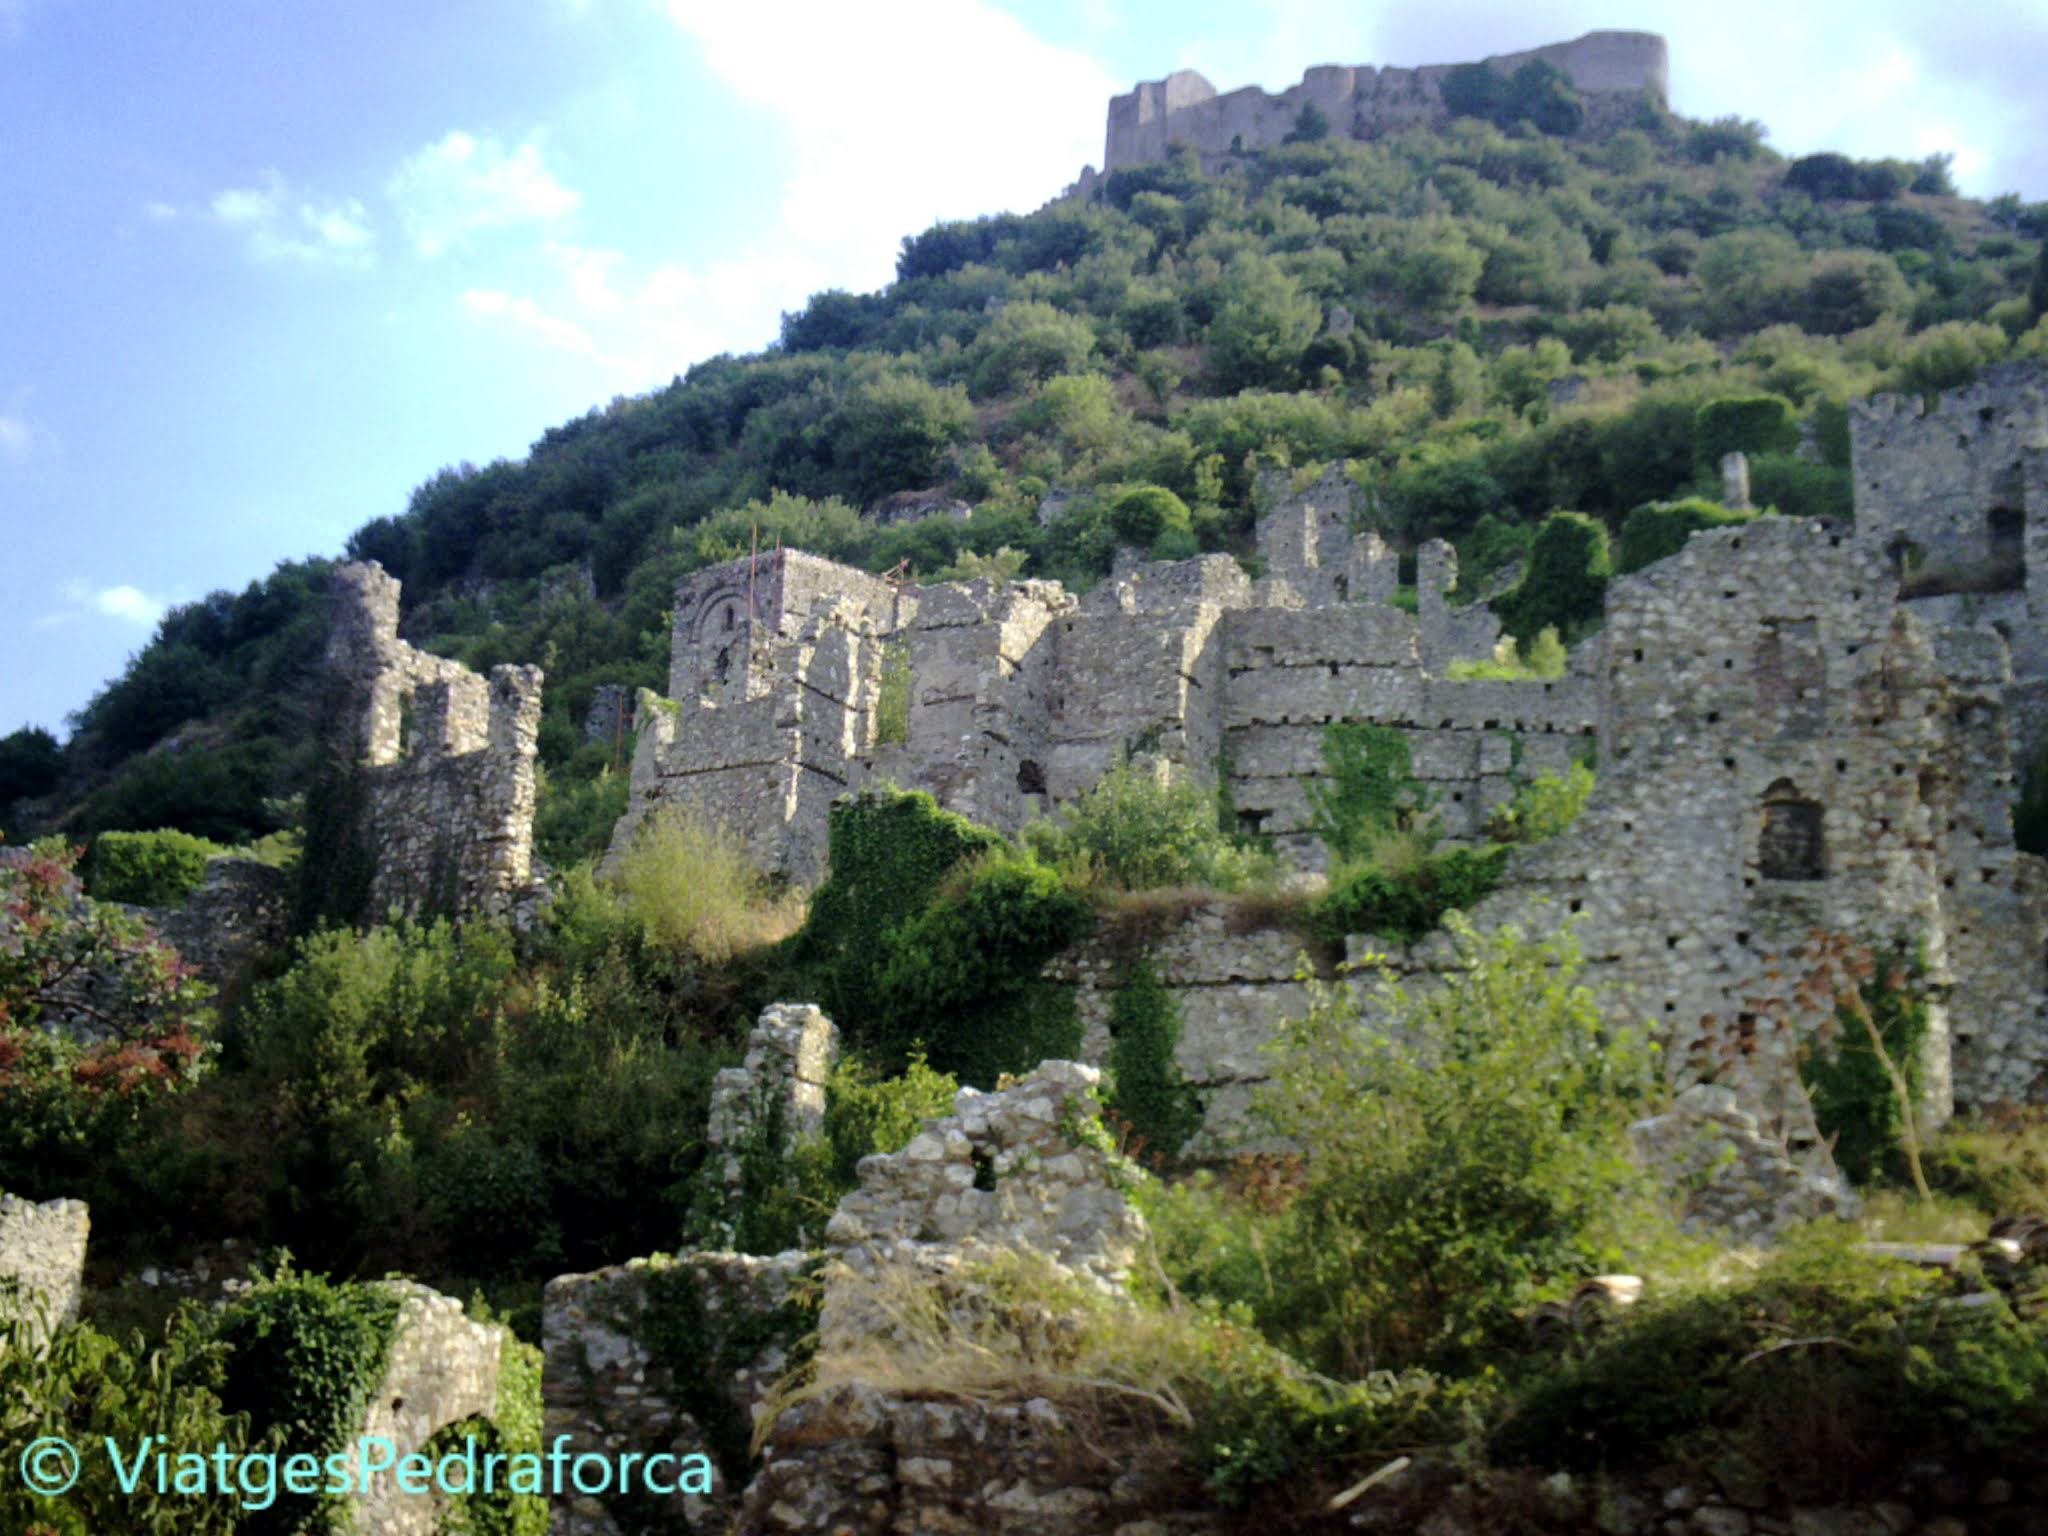 patrimoni de la humanitat, Unesco world heritage